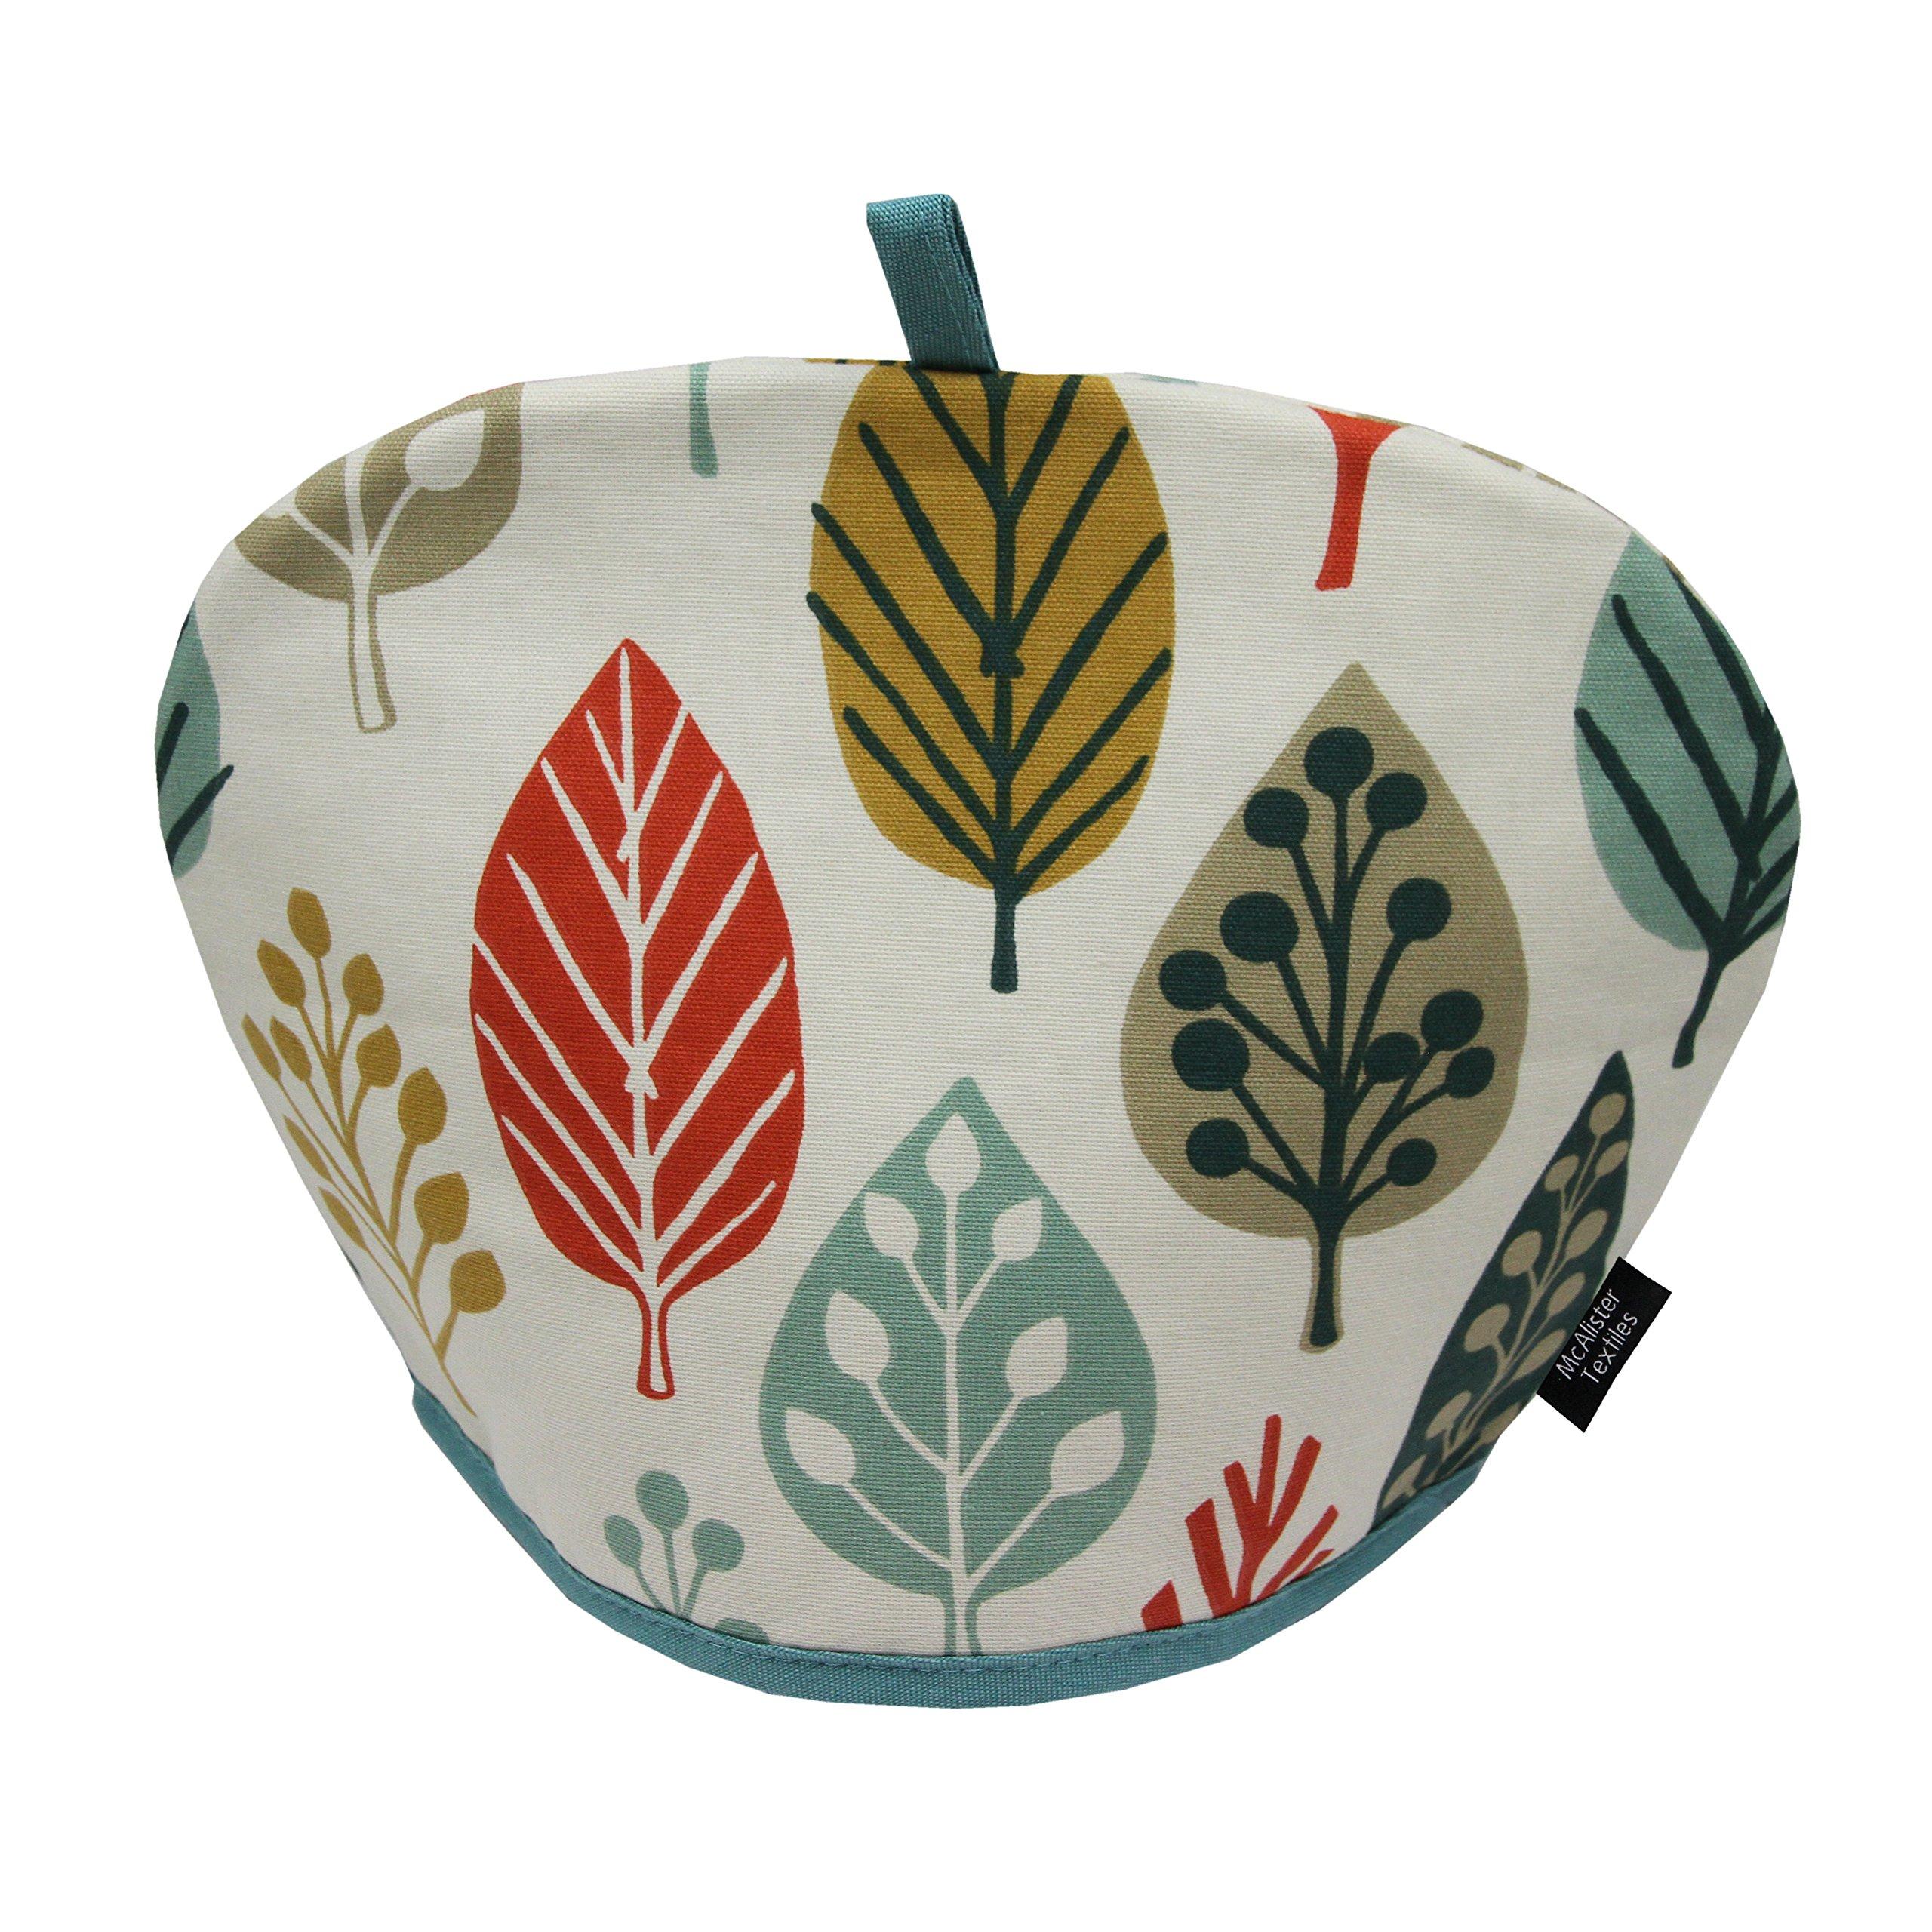 McAlister Magda Designer Decor Tea Cozy Kettle Cover | Terracotta Burnt Orange 100% Cotton | Modern Scandinavian Minimalist Accent